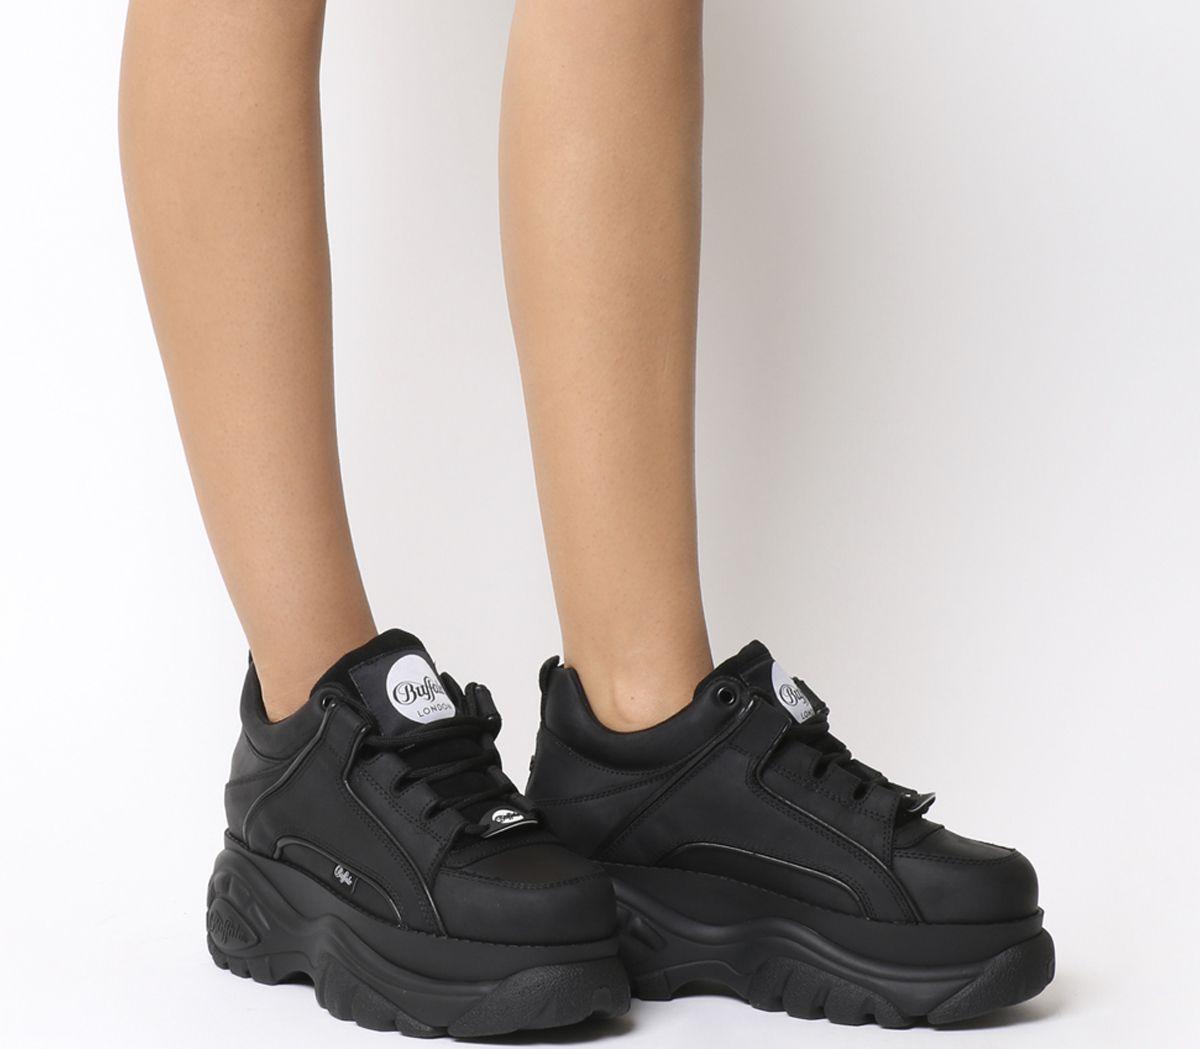 43416b5bedd Buffalo Classic Low Sneakers